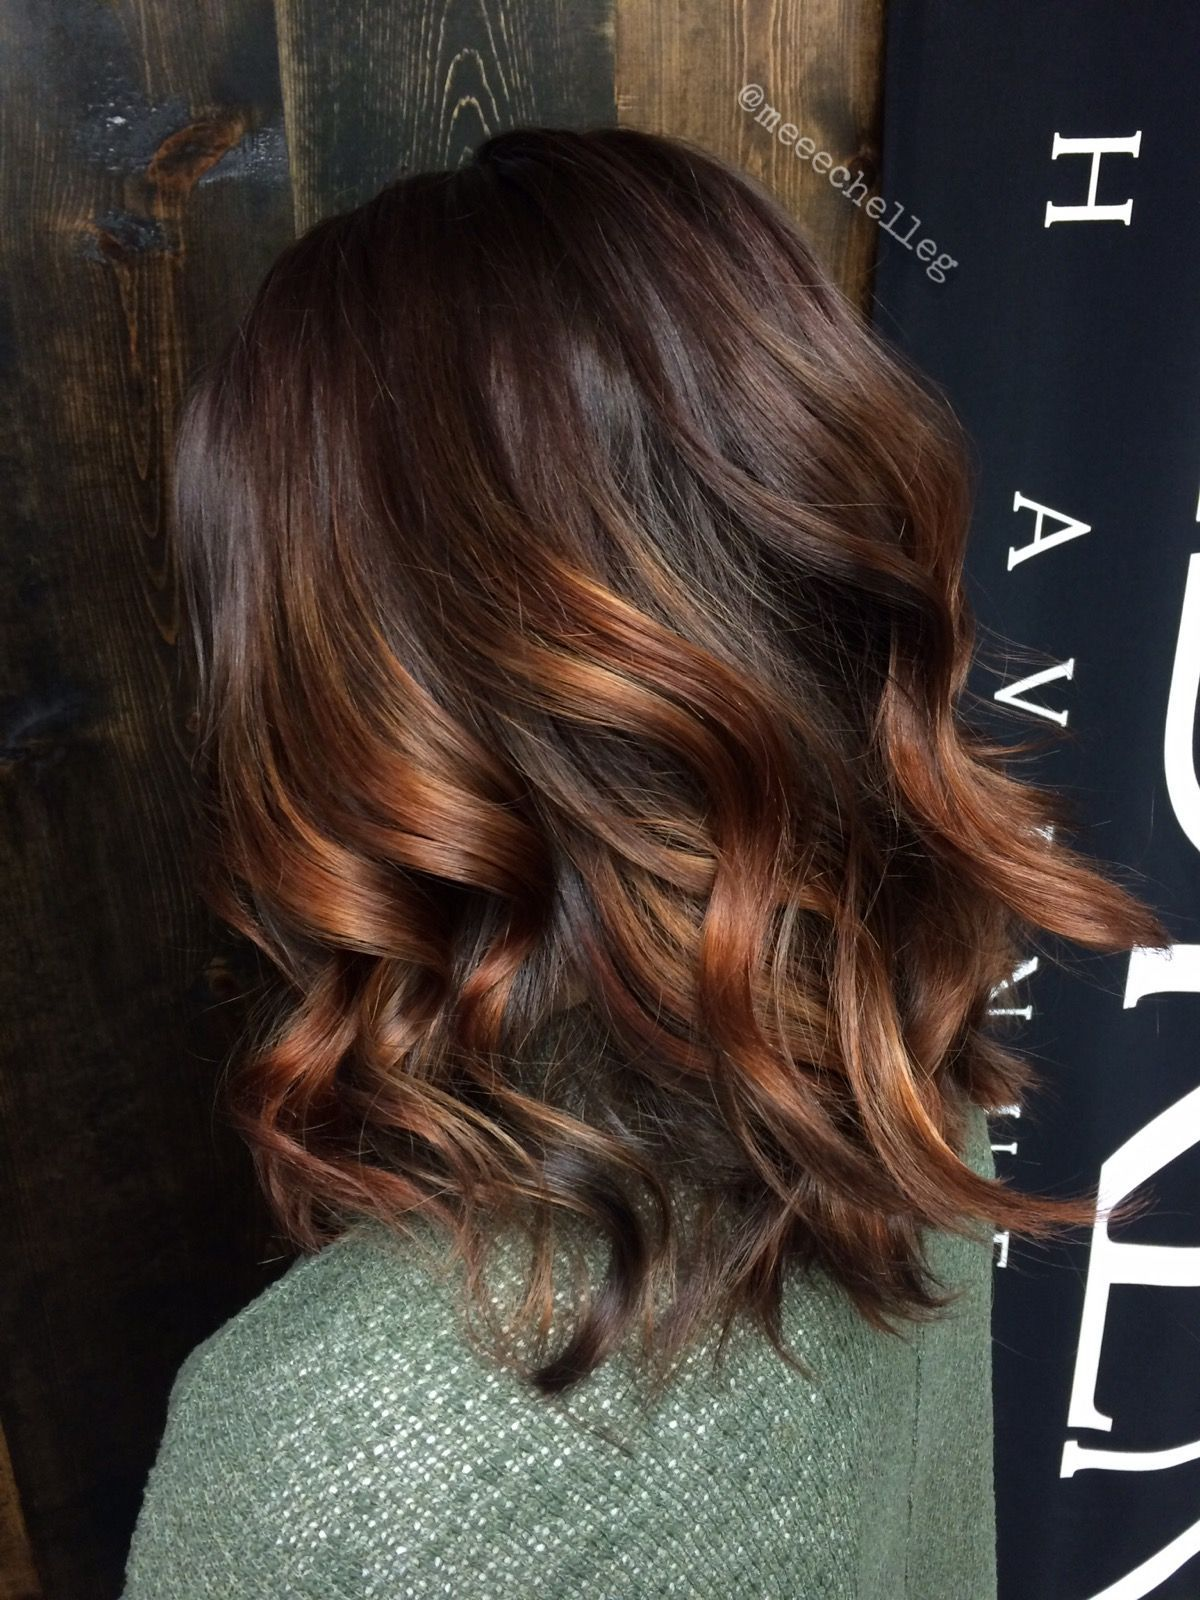 Log Medium Hair Curls Loose Curls Texture Curling Iron Curls Shine Lines Balayage Peach Warm Brunett Medium Hair Styles Long Hair Styles Warm Brunette